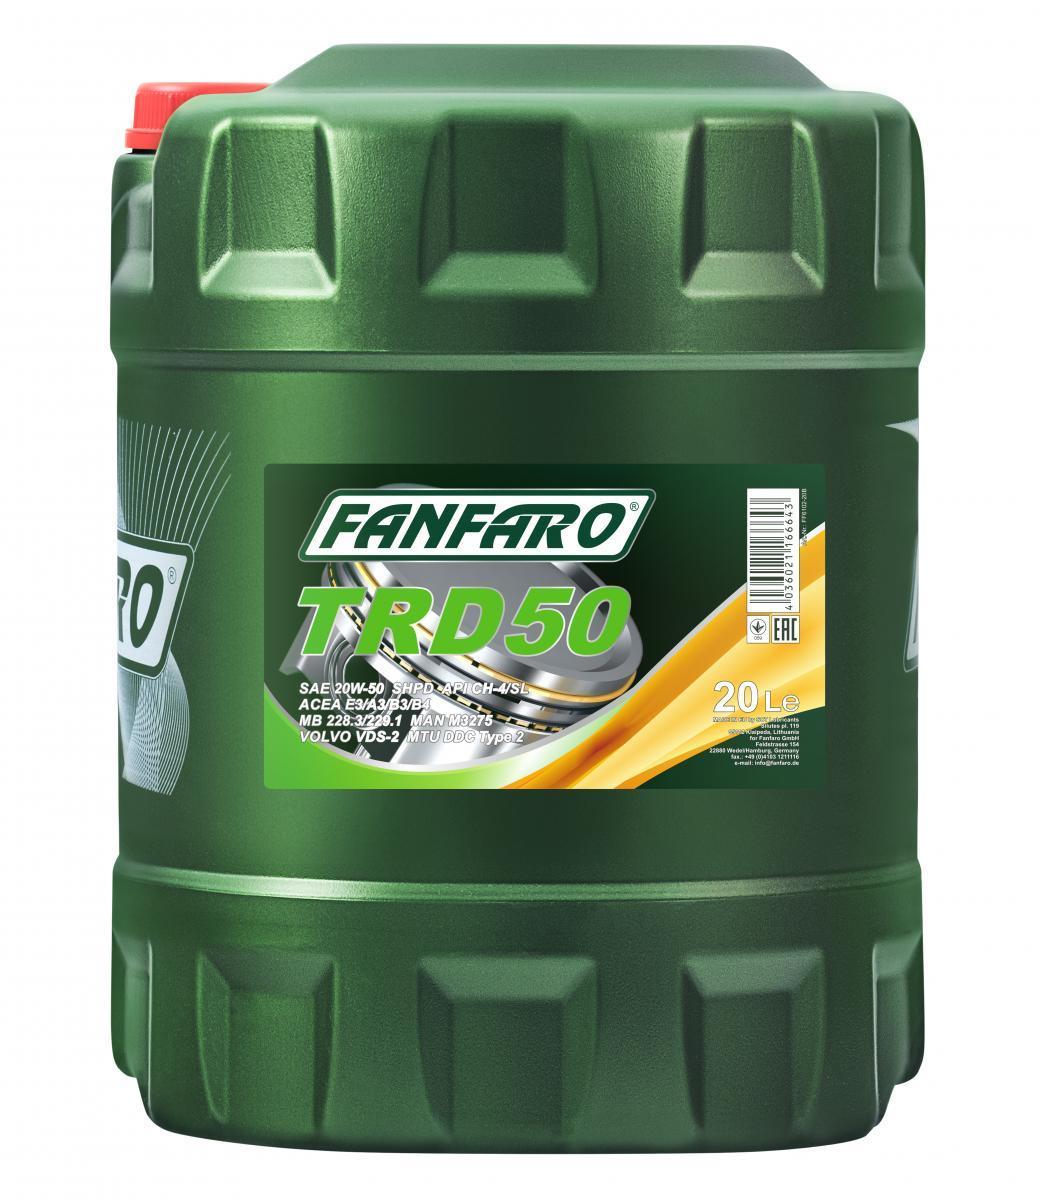 FANFARO SHPD, TRD 50 FF6102-20 Motoröl